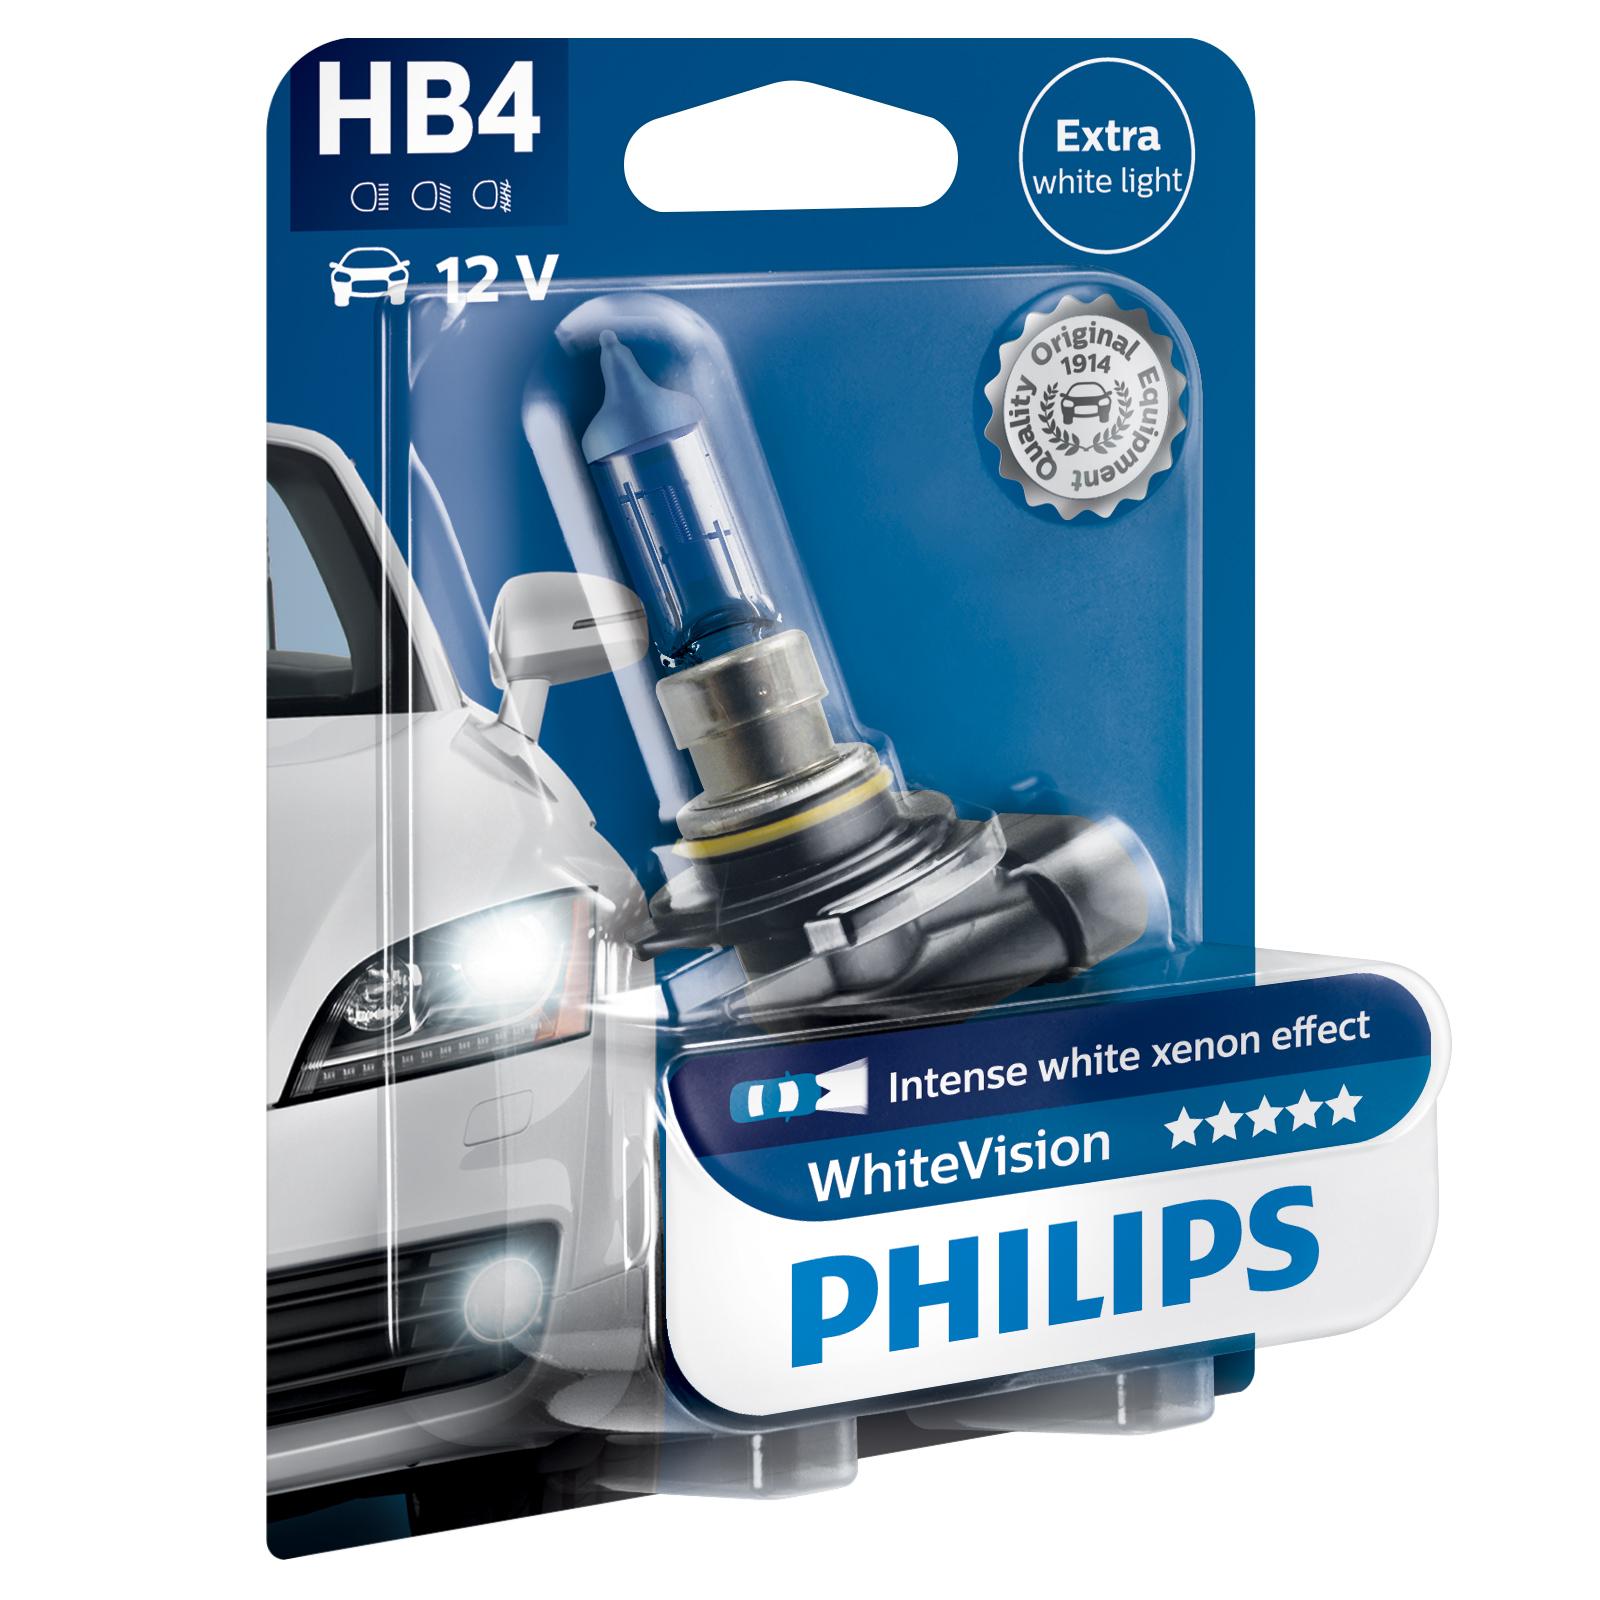 Philips-WhiteVision-Car-Headlight-Bulbs-H1-H3-H4-H7-H8-HB3-HB4-H11-White-Vision